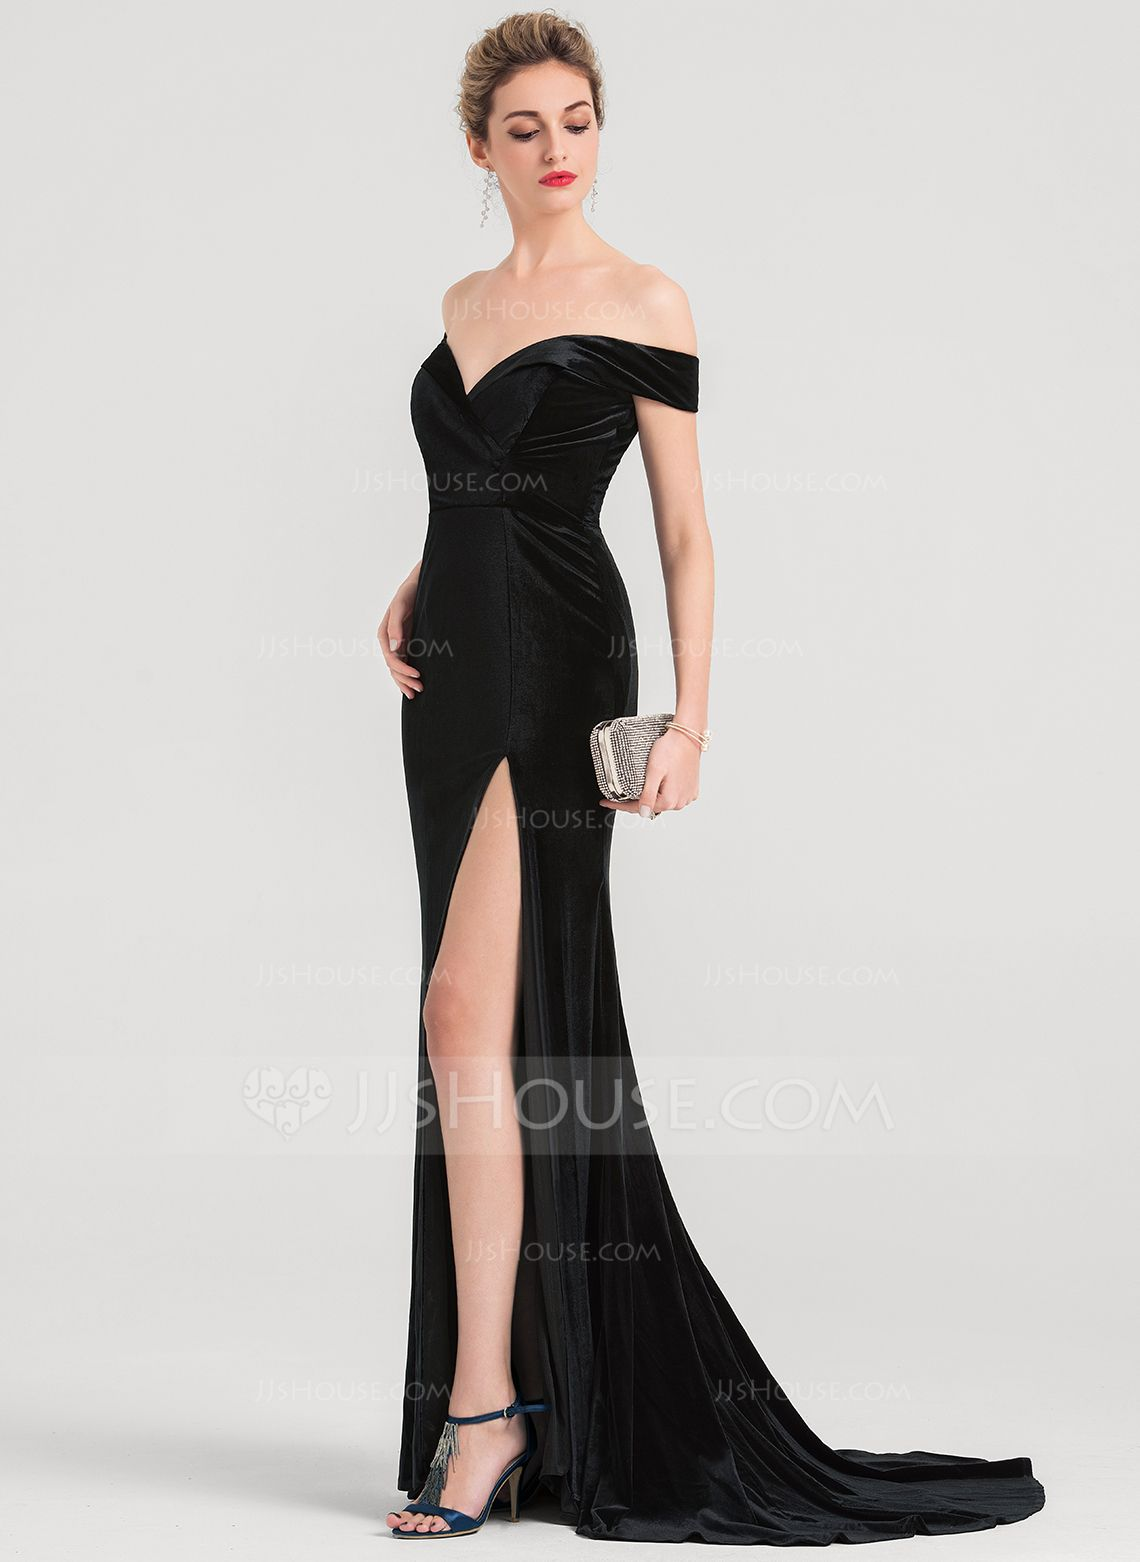 da34c1d5fc4f Trumpet/Mermaid Off-the-Shoulder Sweep Train Velvet Evening Dress With  Split Front (017147970) - Evening Dresses - JJsHouse